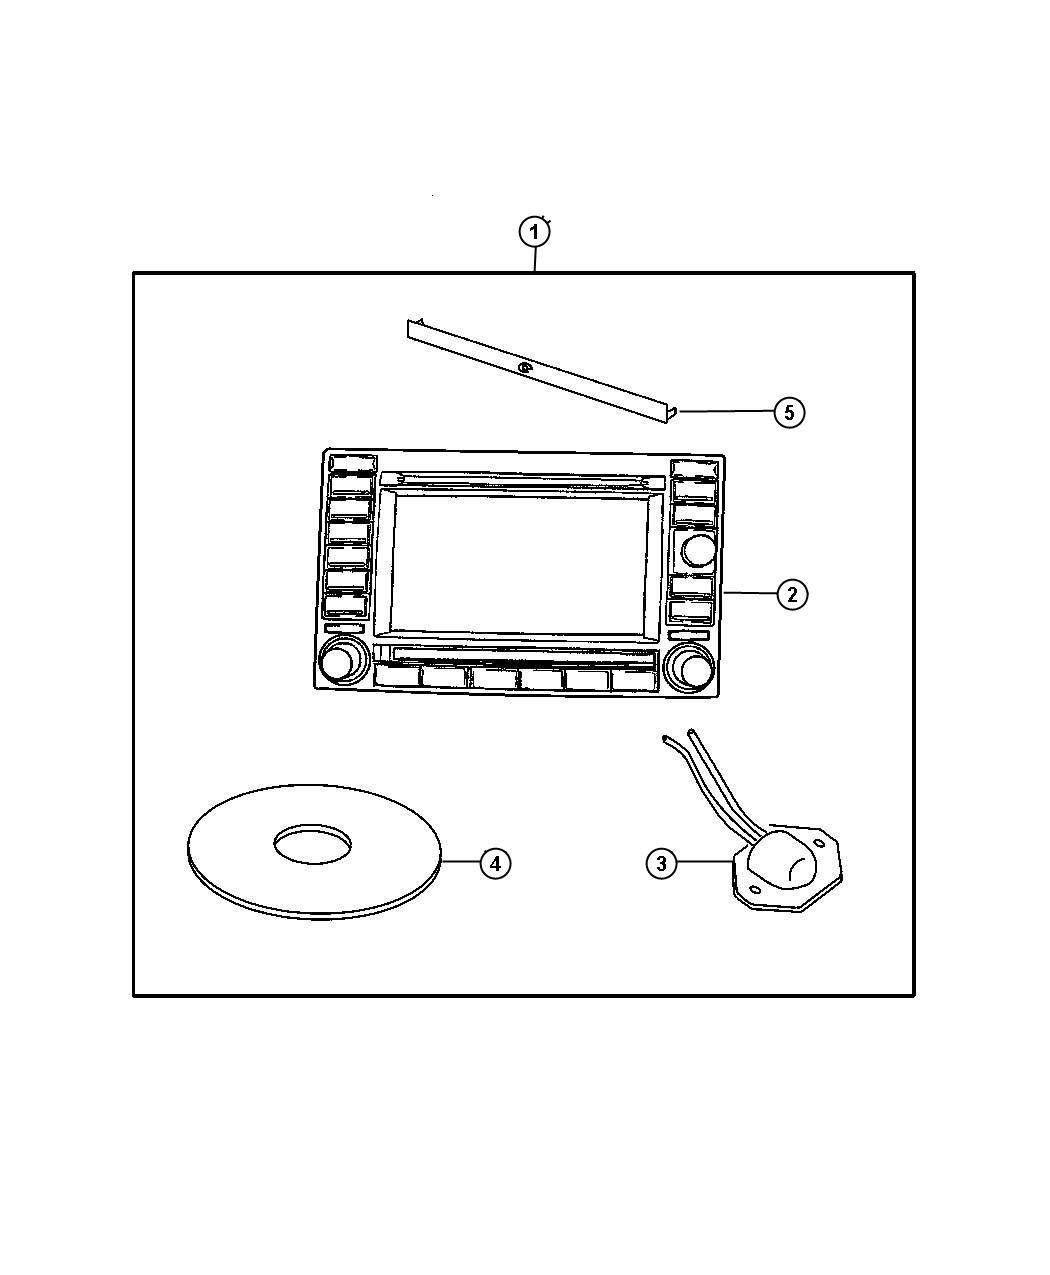 05064184ah mopar radio am fm cd w nav dvd cd ctrl. Black Bedroom Furniture Sets. Home Design Ideas